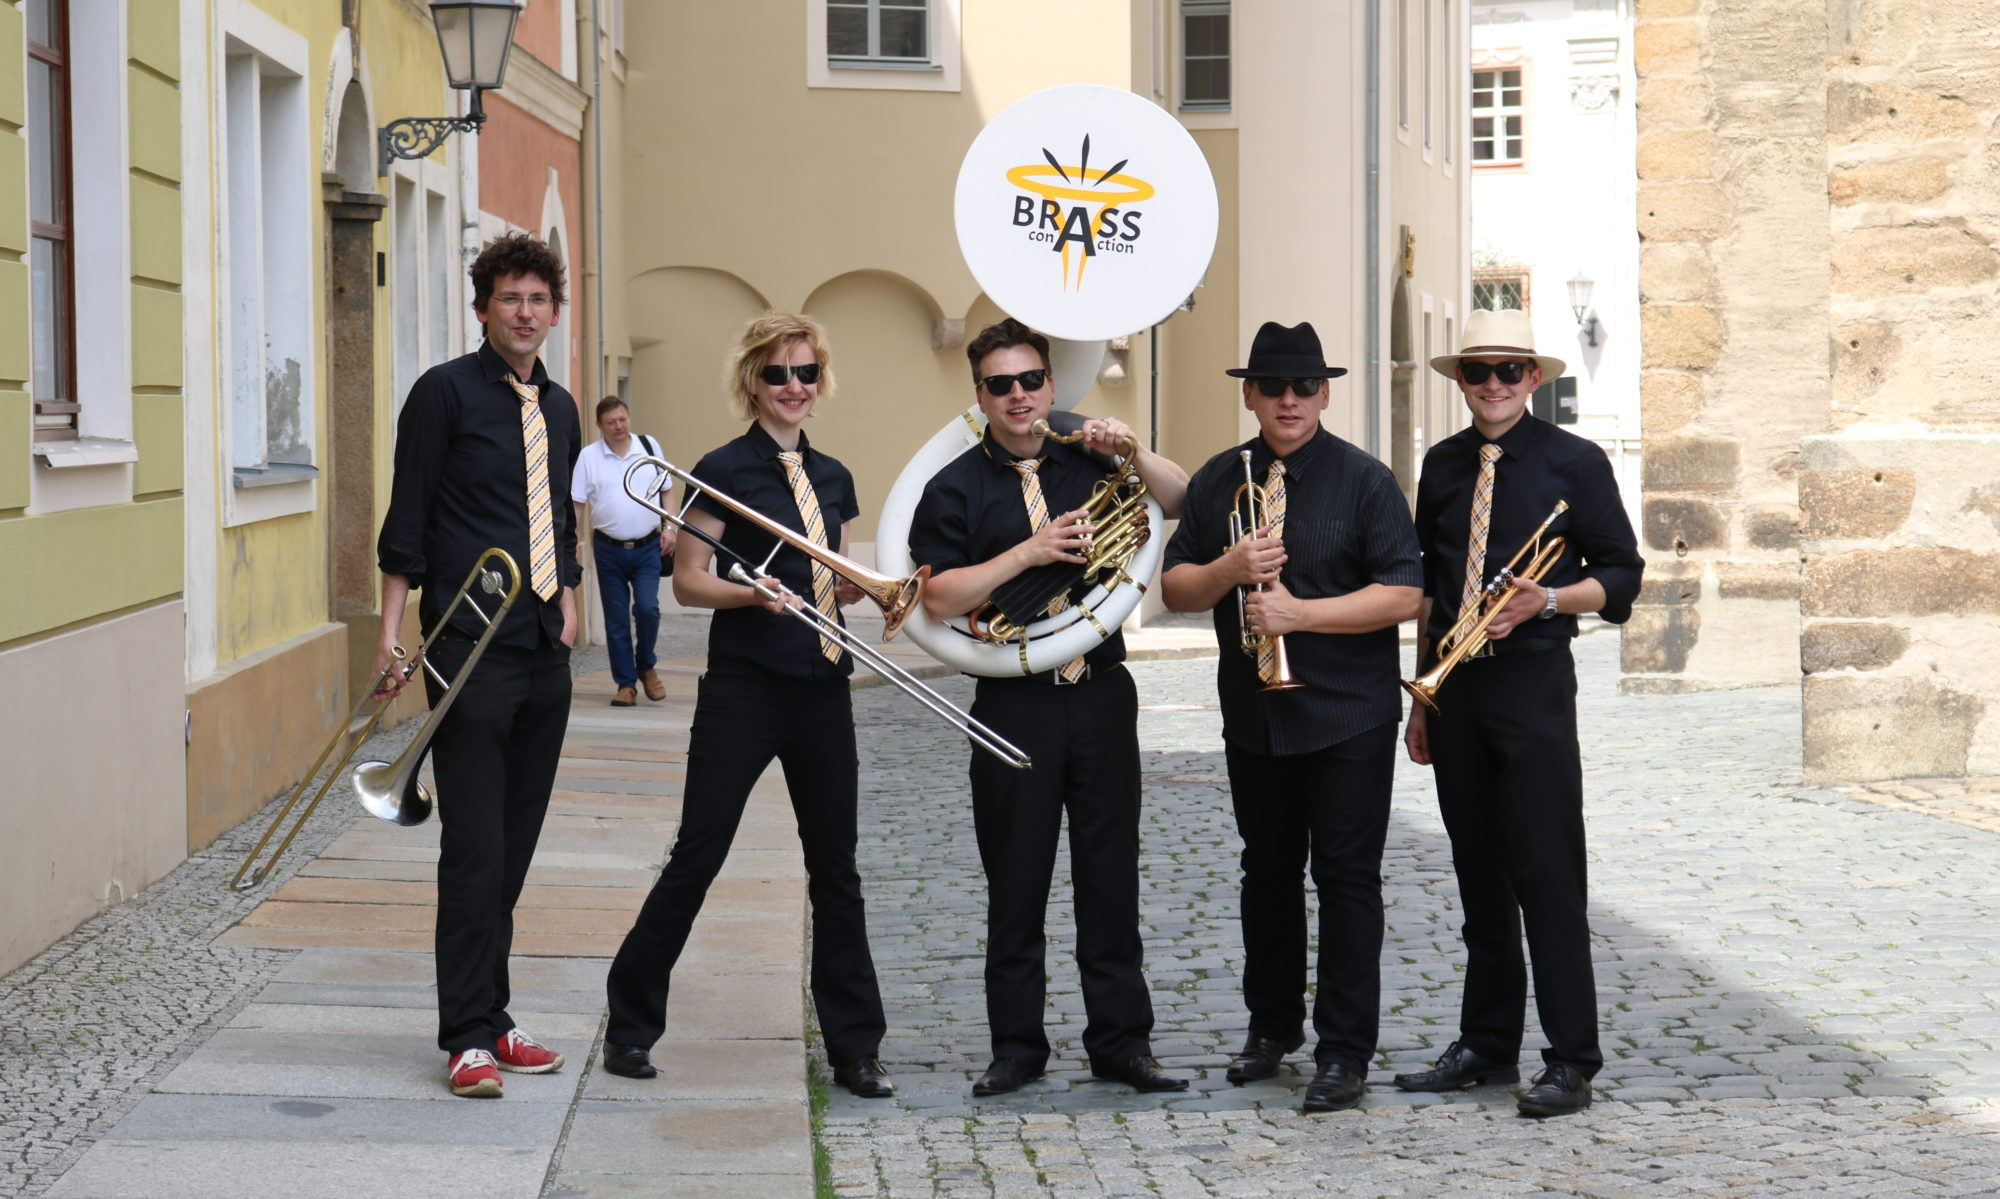 Brass conAction